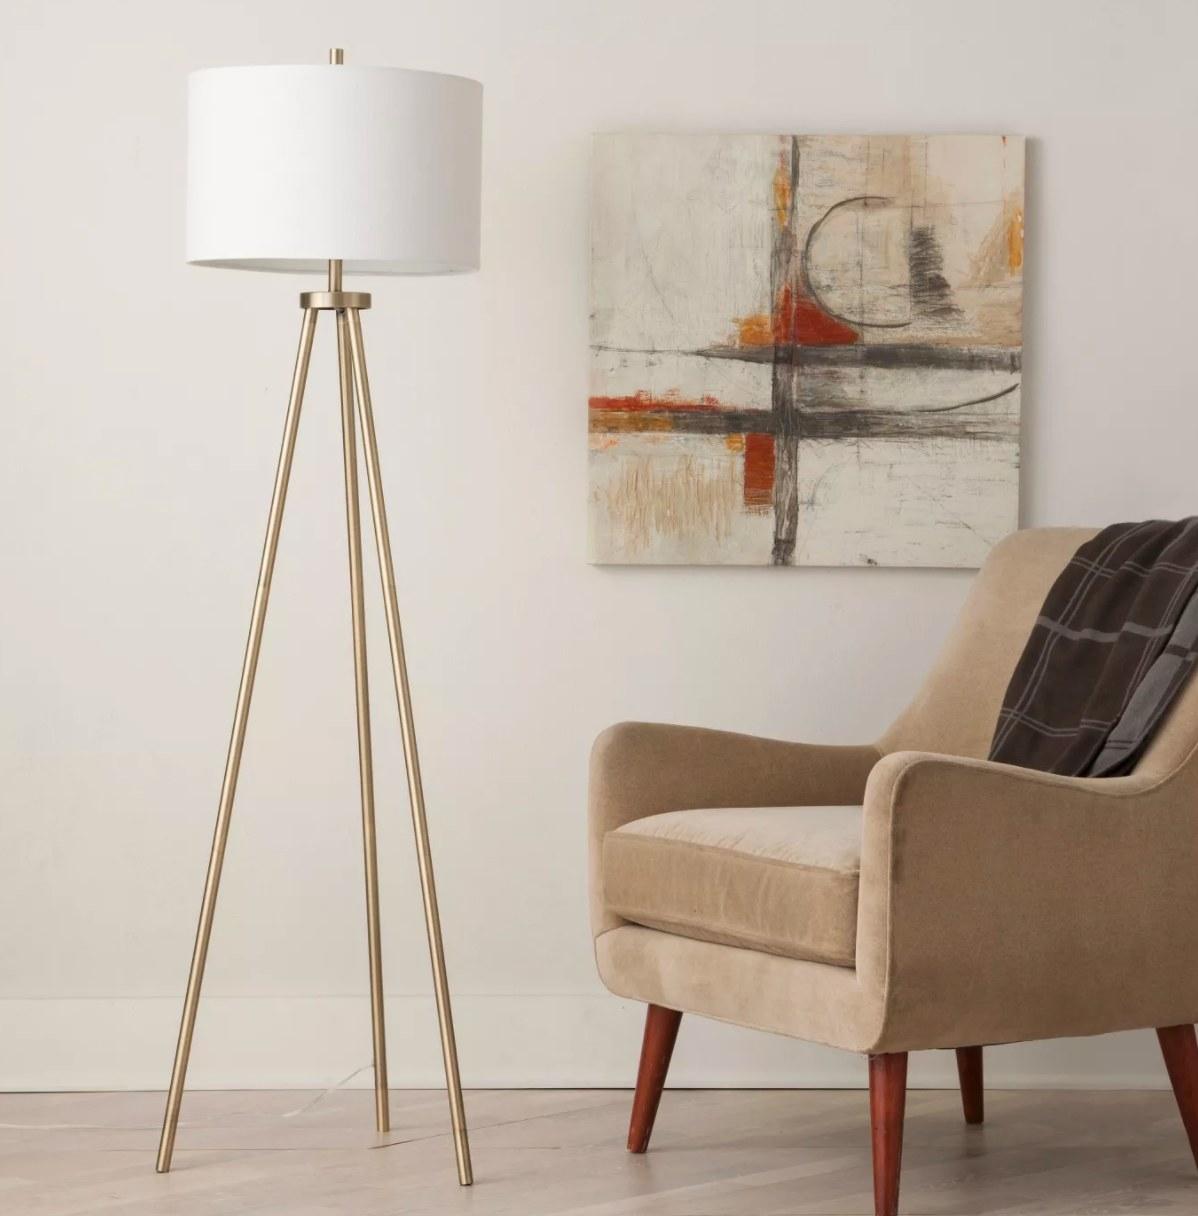 The tripod floor lamp